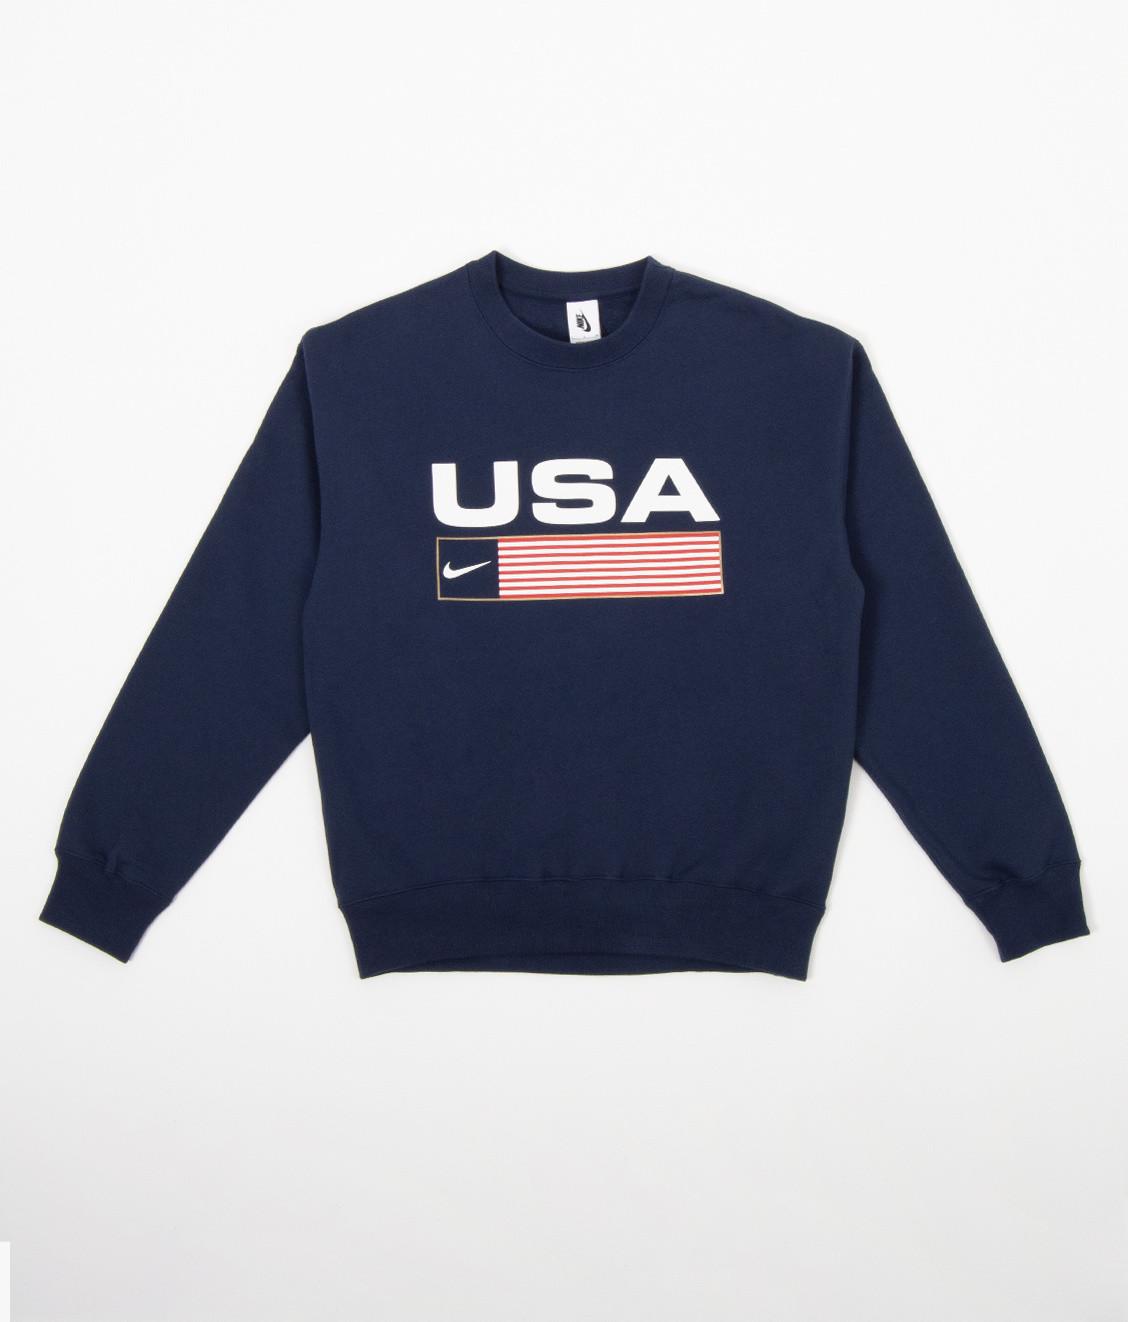 Nike Nike NRG Crew Swoosh Stripe USA Navy